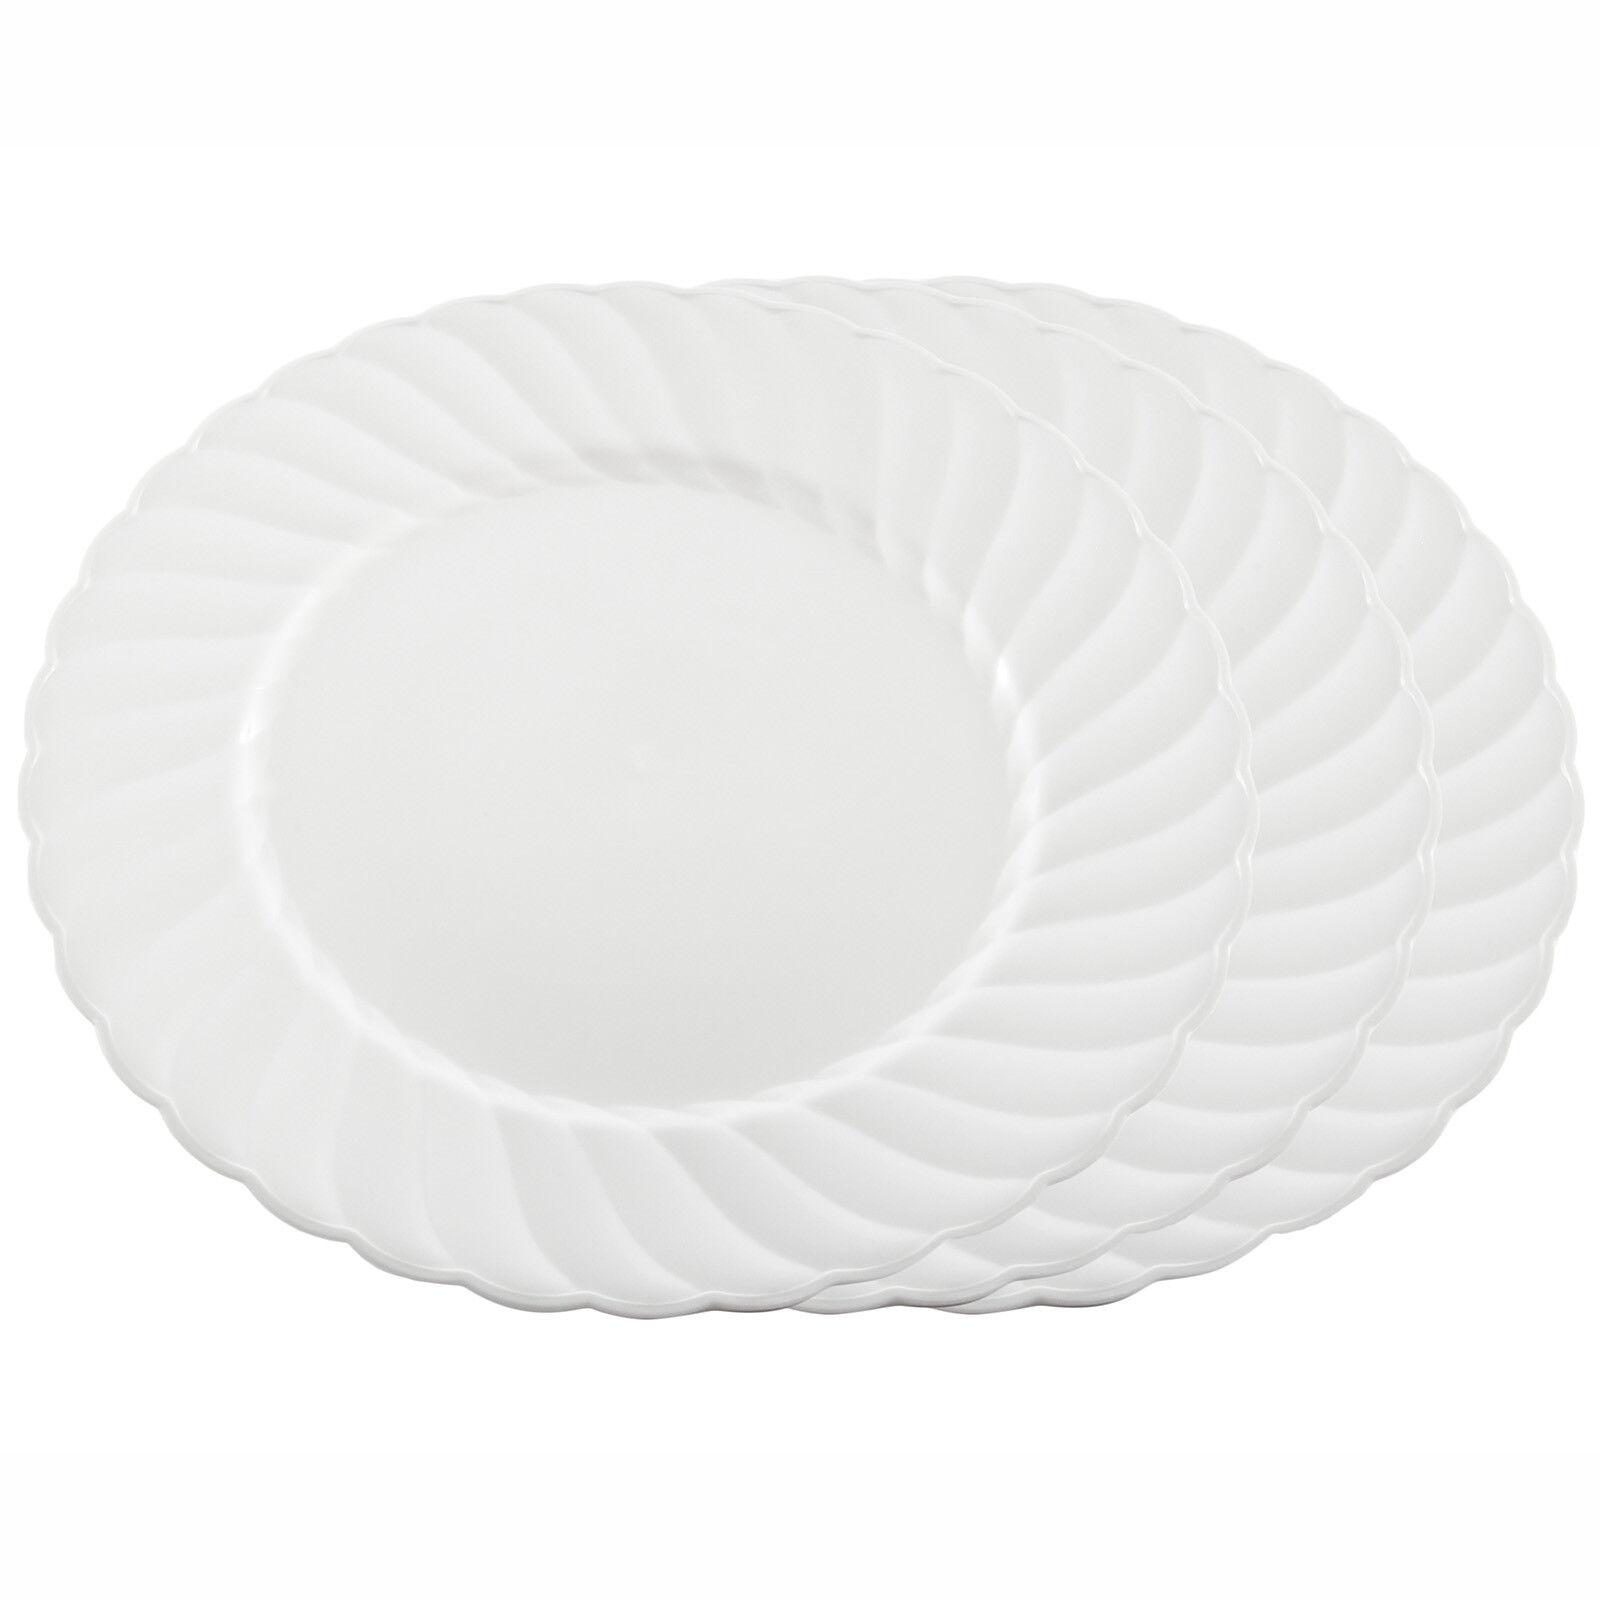 7   18cm Weiß Fancy Elegant Side Plates -Heavy Duty Disposable Plastic UK Party